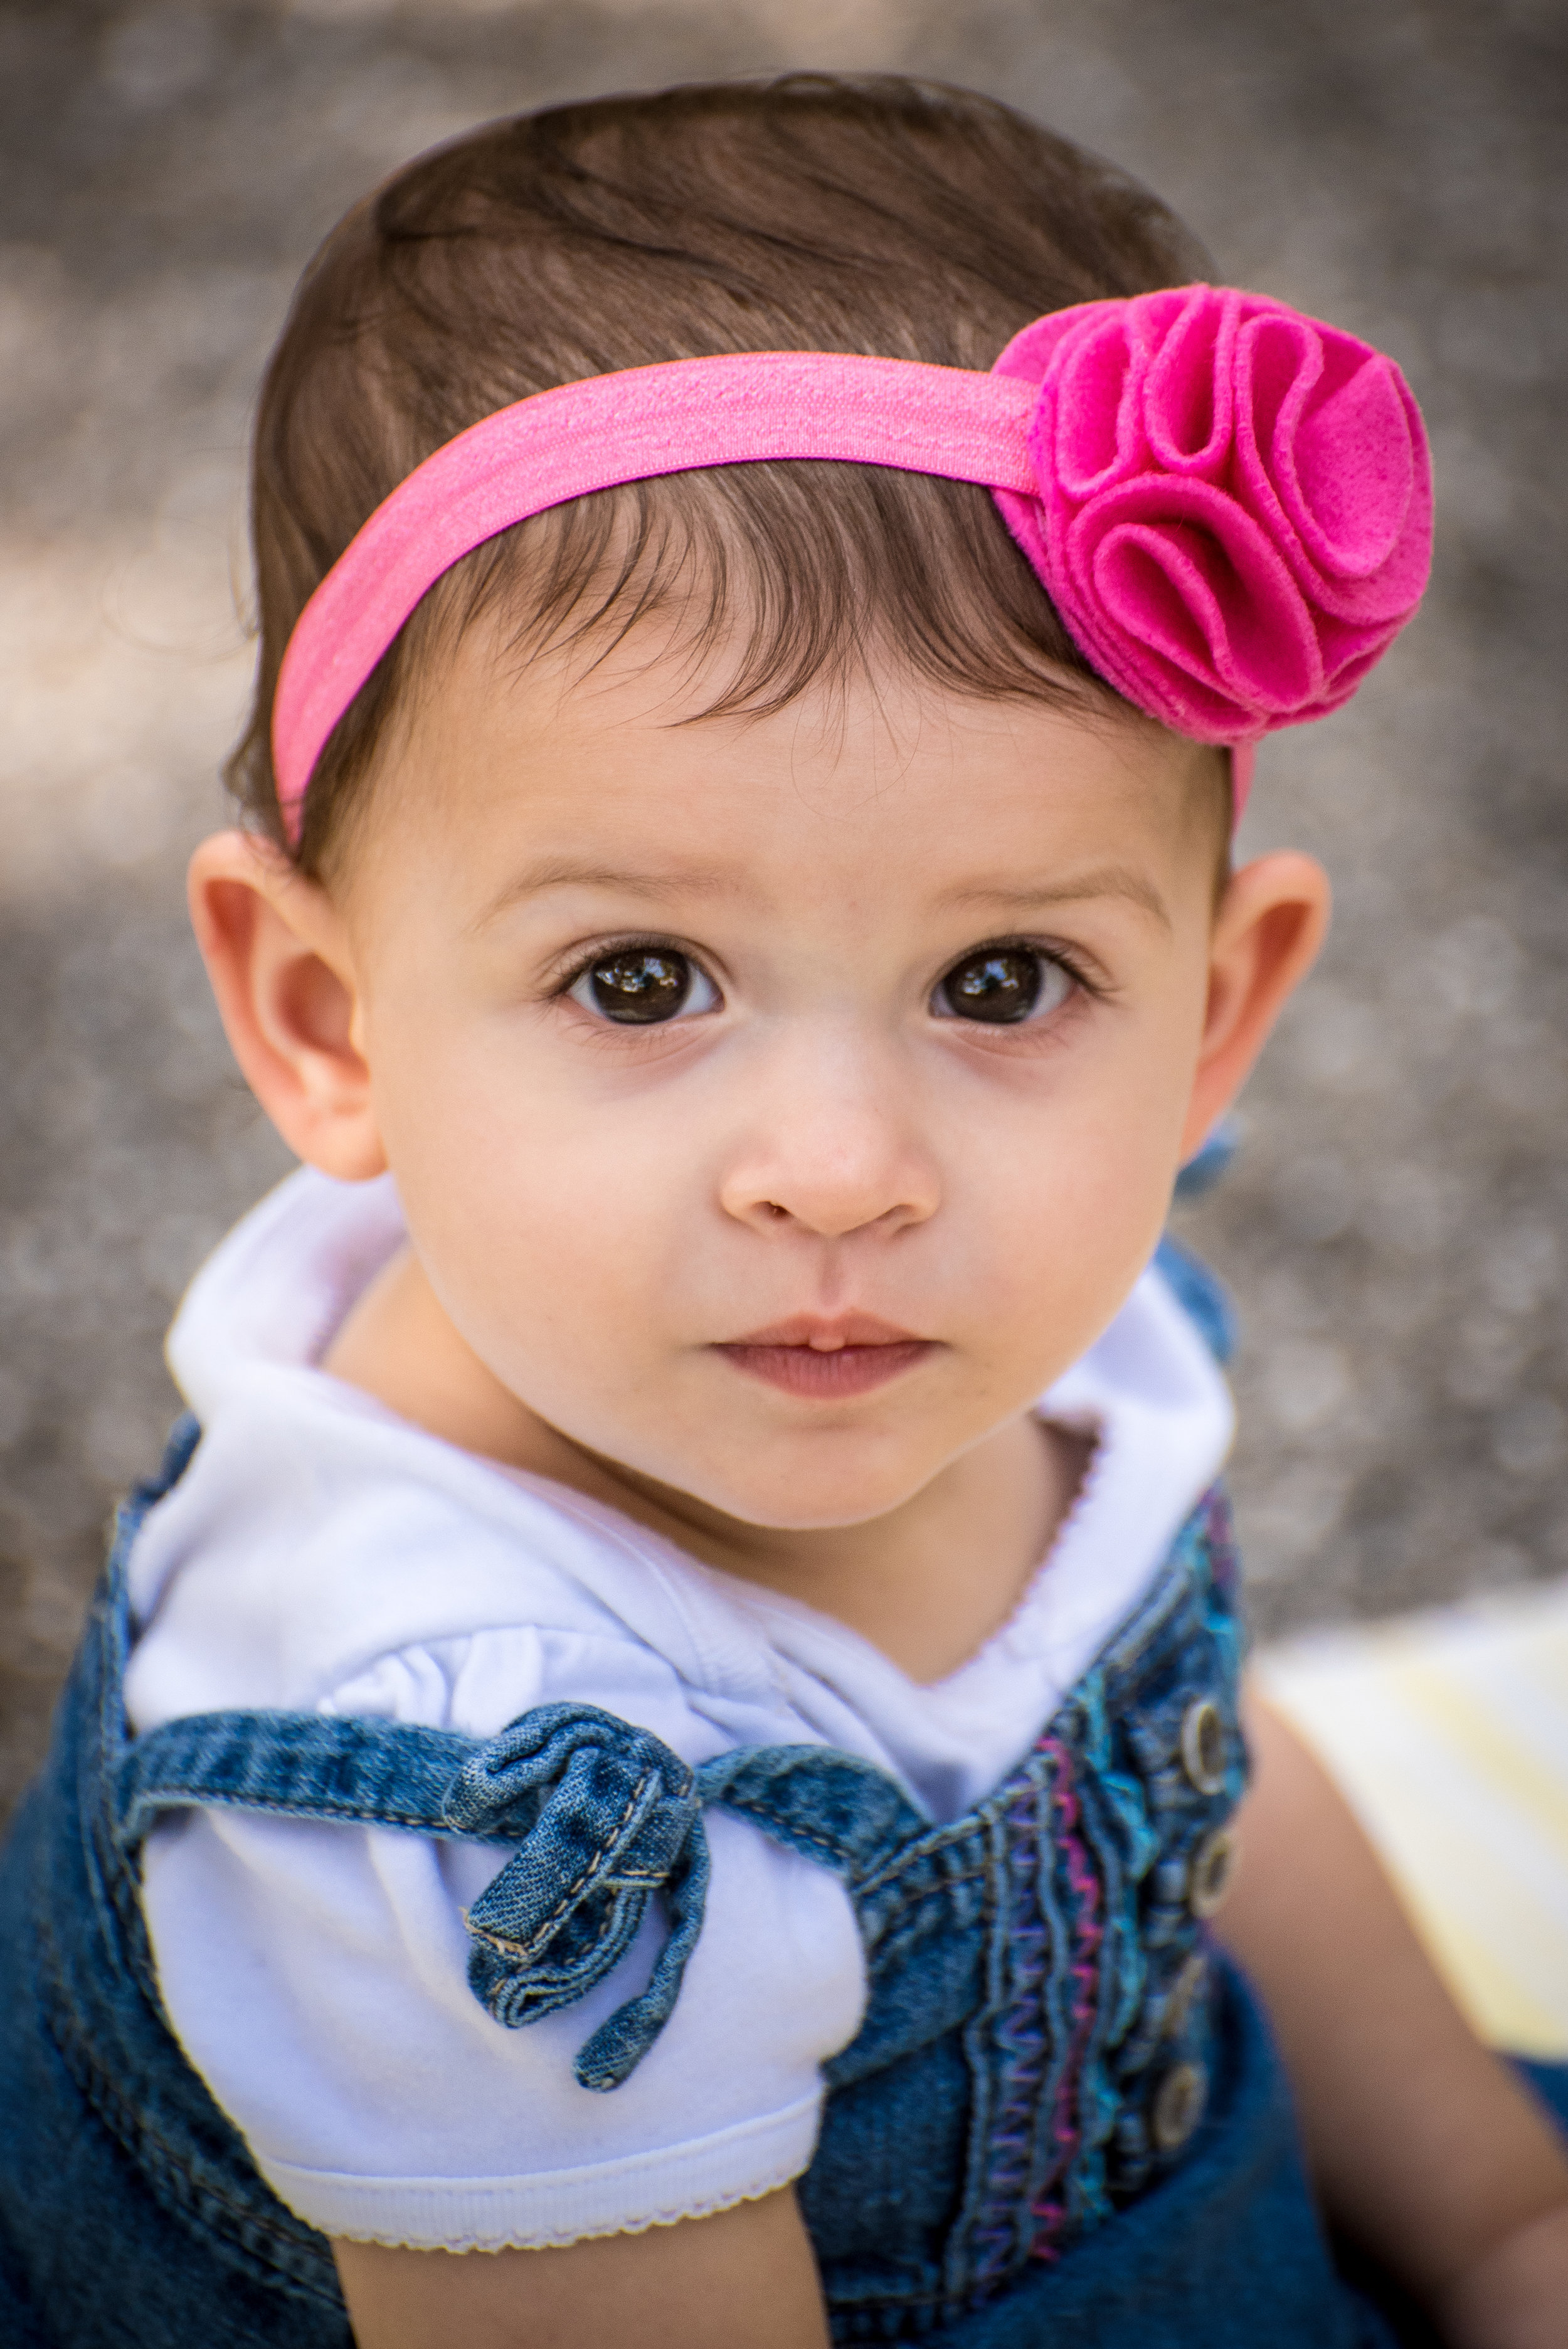 Baby-Madison-5.jpg